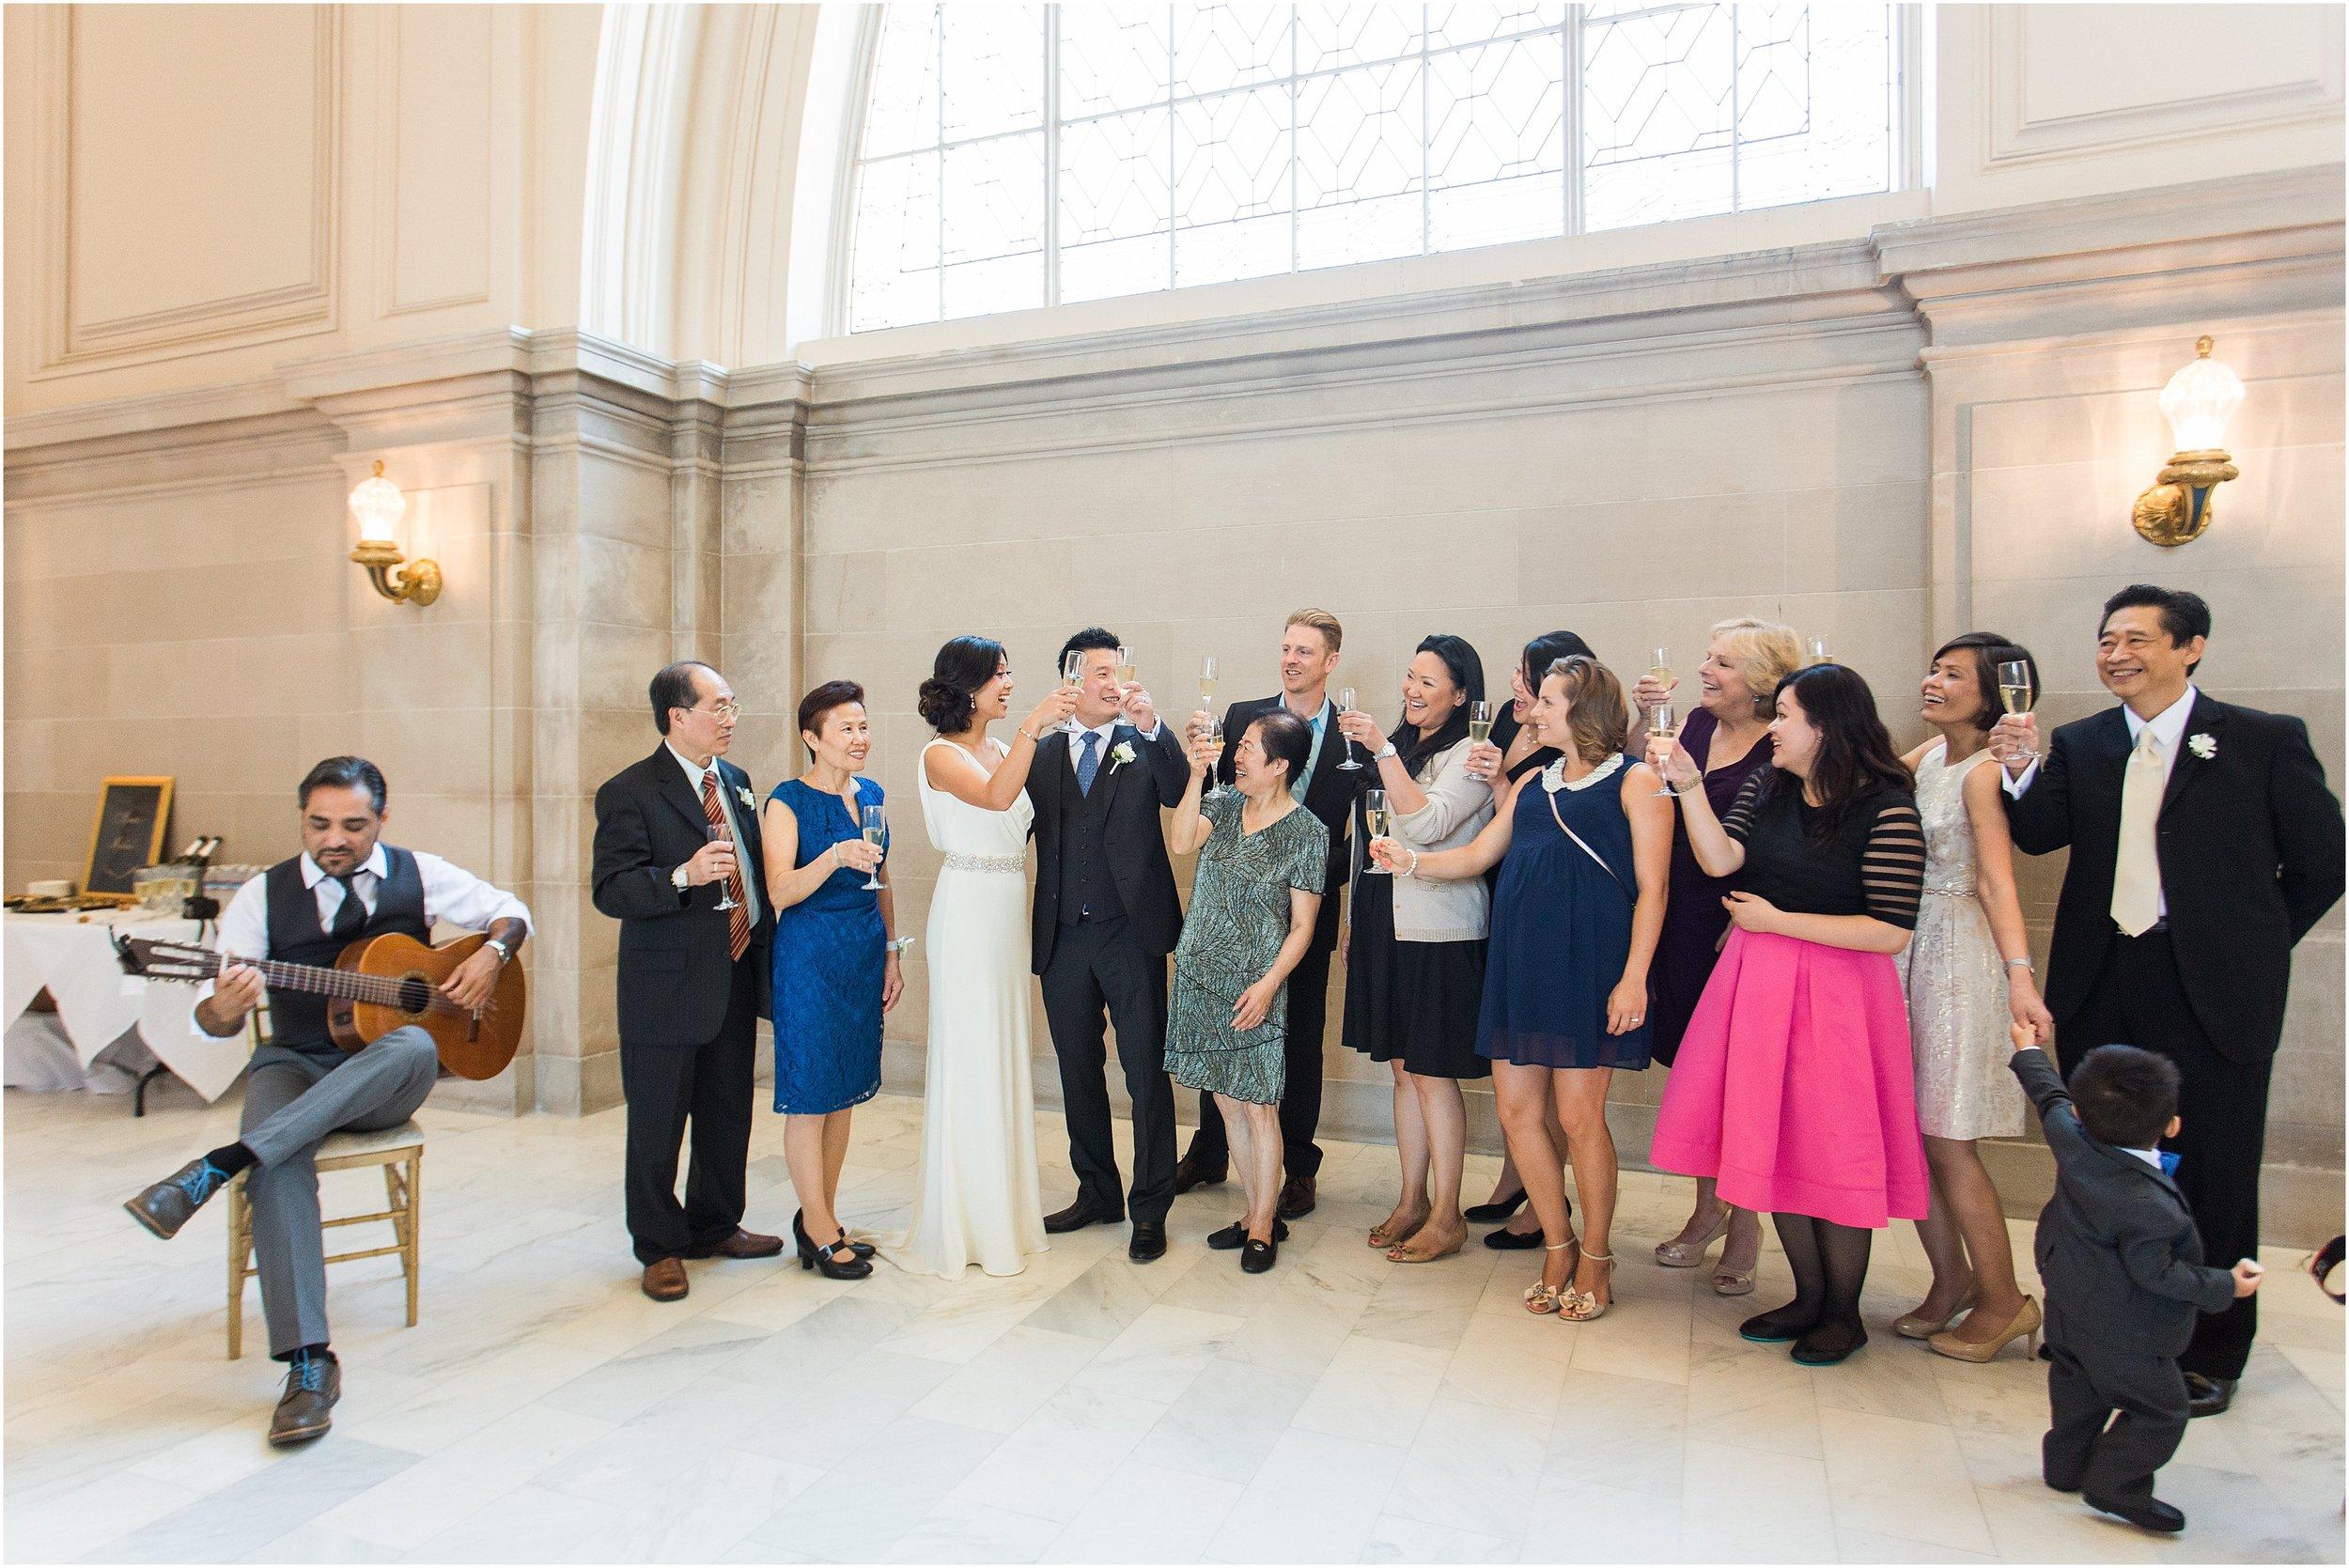 San_Francisco_City_Hall_Wedding_photographer-18.jpg